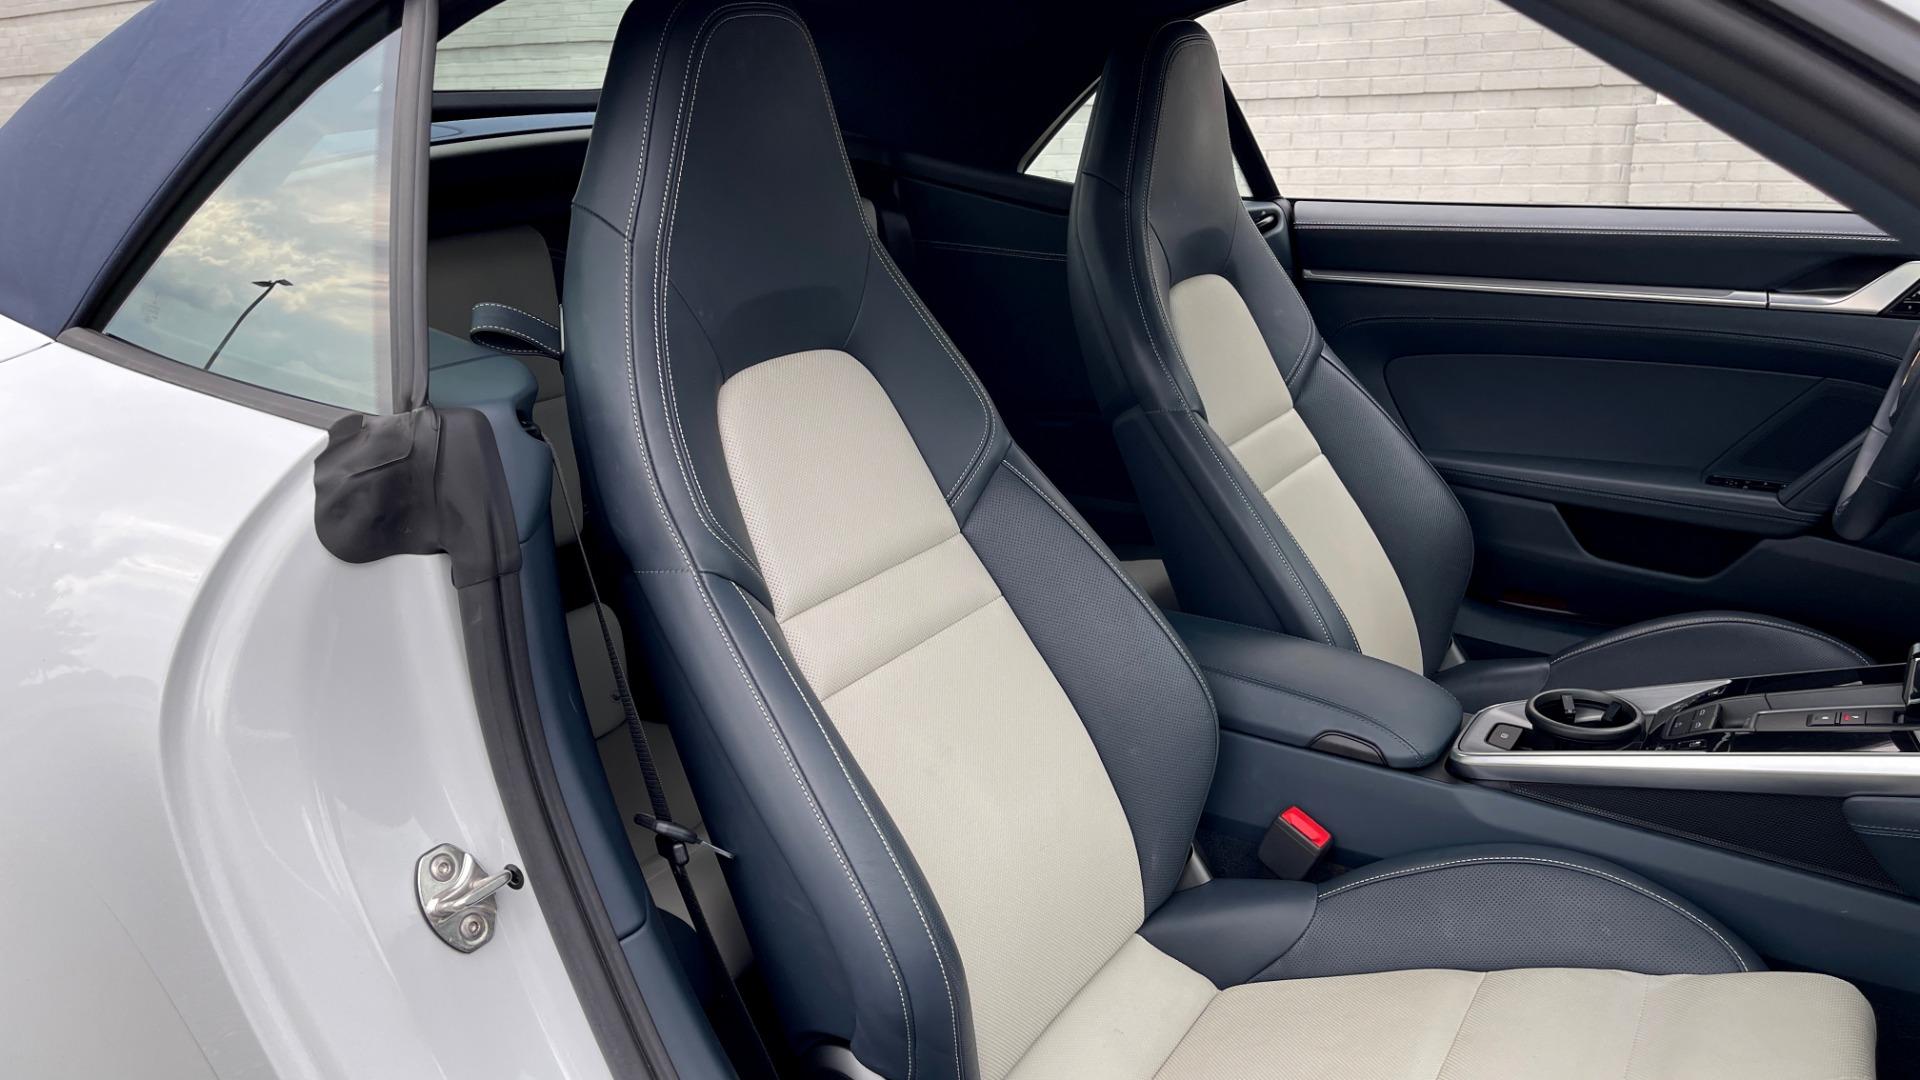 Used 2020 Porsche 911 CARRERA 4S CABRIOLET PREMIUM SPORT PKG / NAV / BOSE / LIGHT DESIGN PKG for sale $167,595 at Formula Imports in Charlotte NC 28227 75